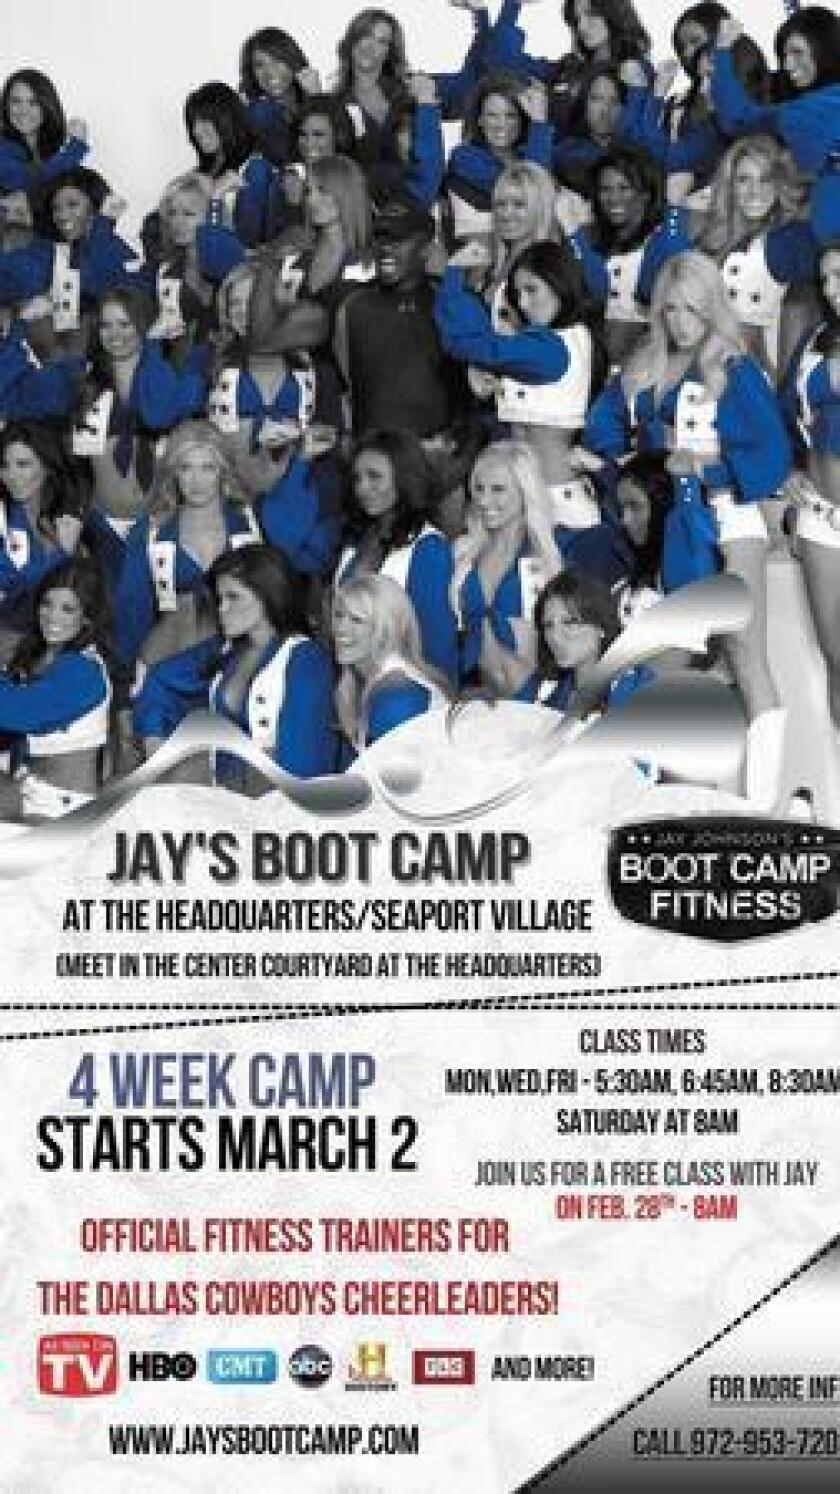 sddsd-jays_bootcamp-20160820